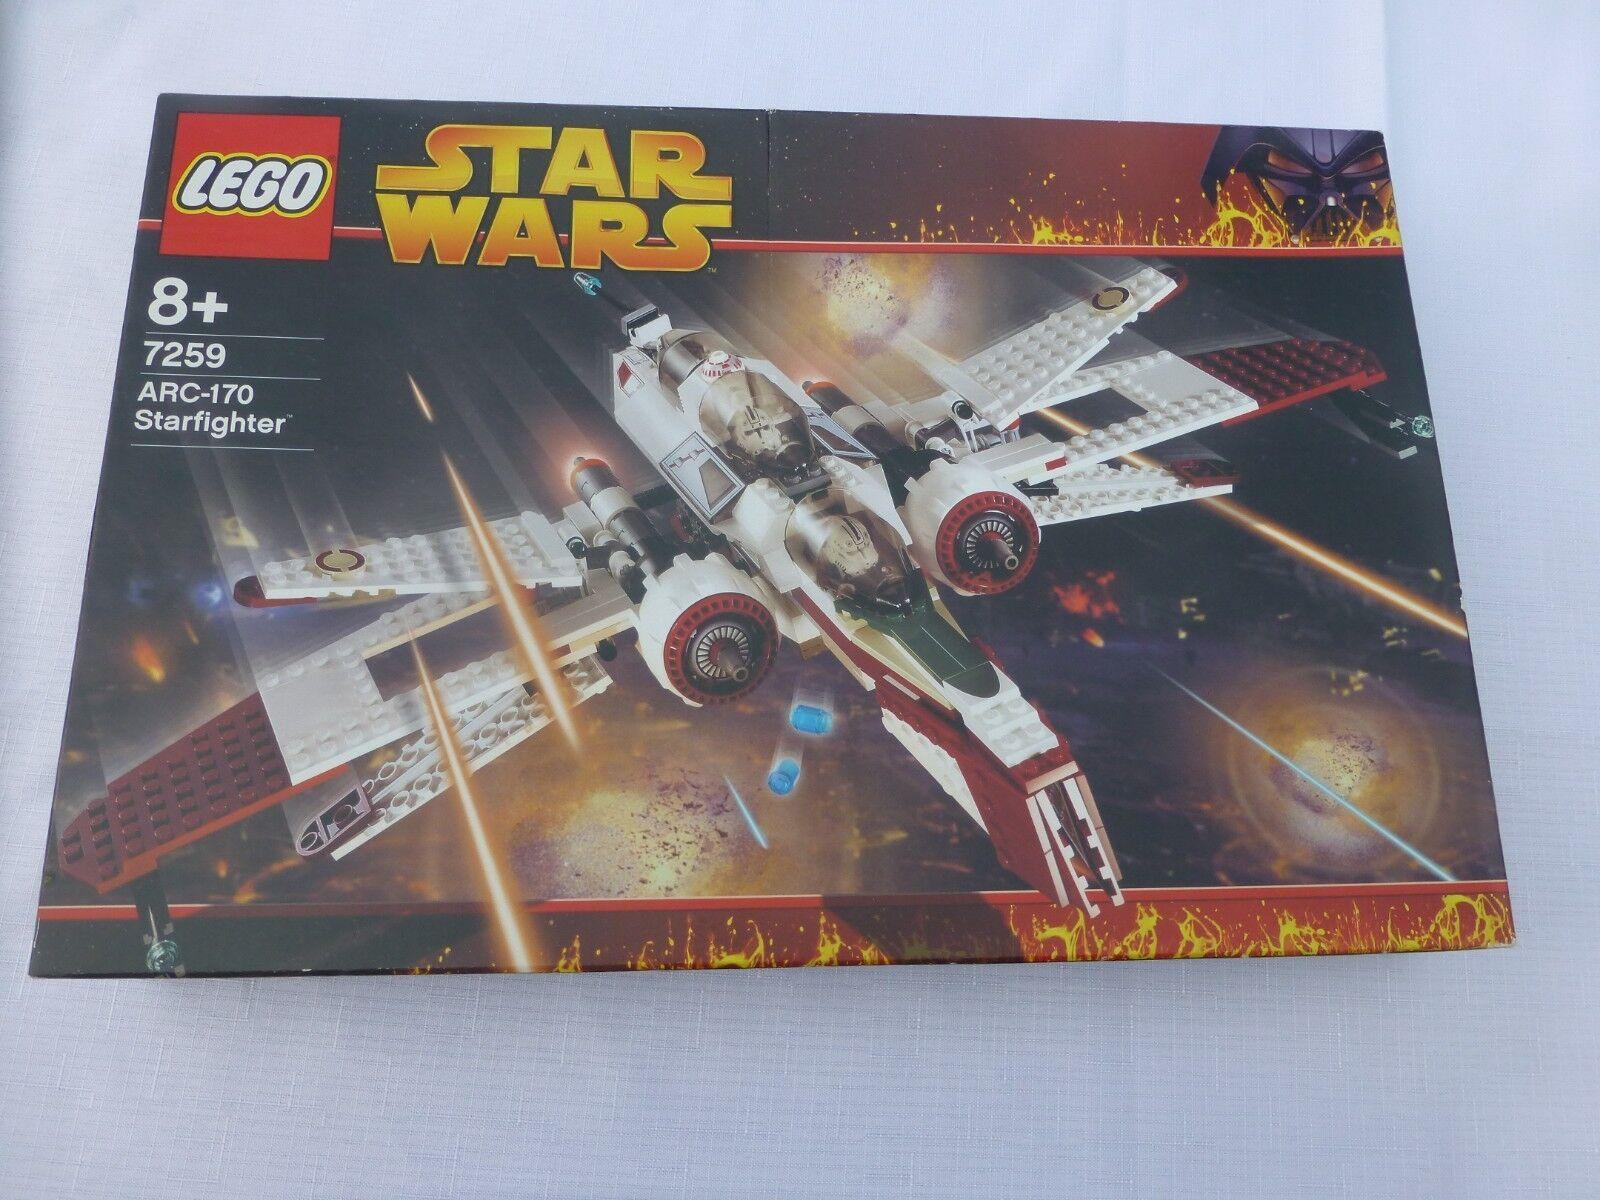 LEGO Star Wars 7259 ARC-170 Starfighter [BRAND NEW]